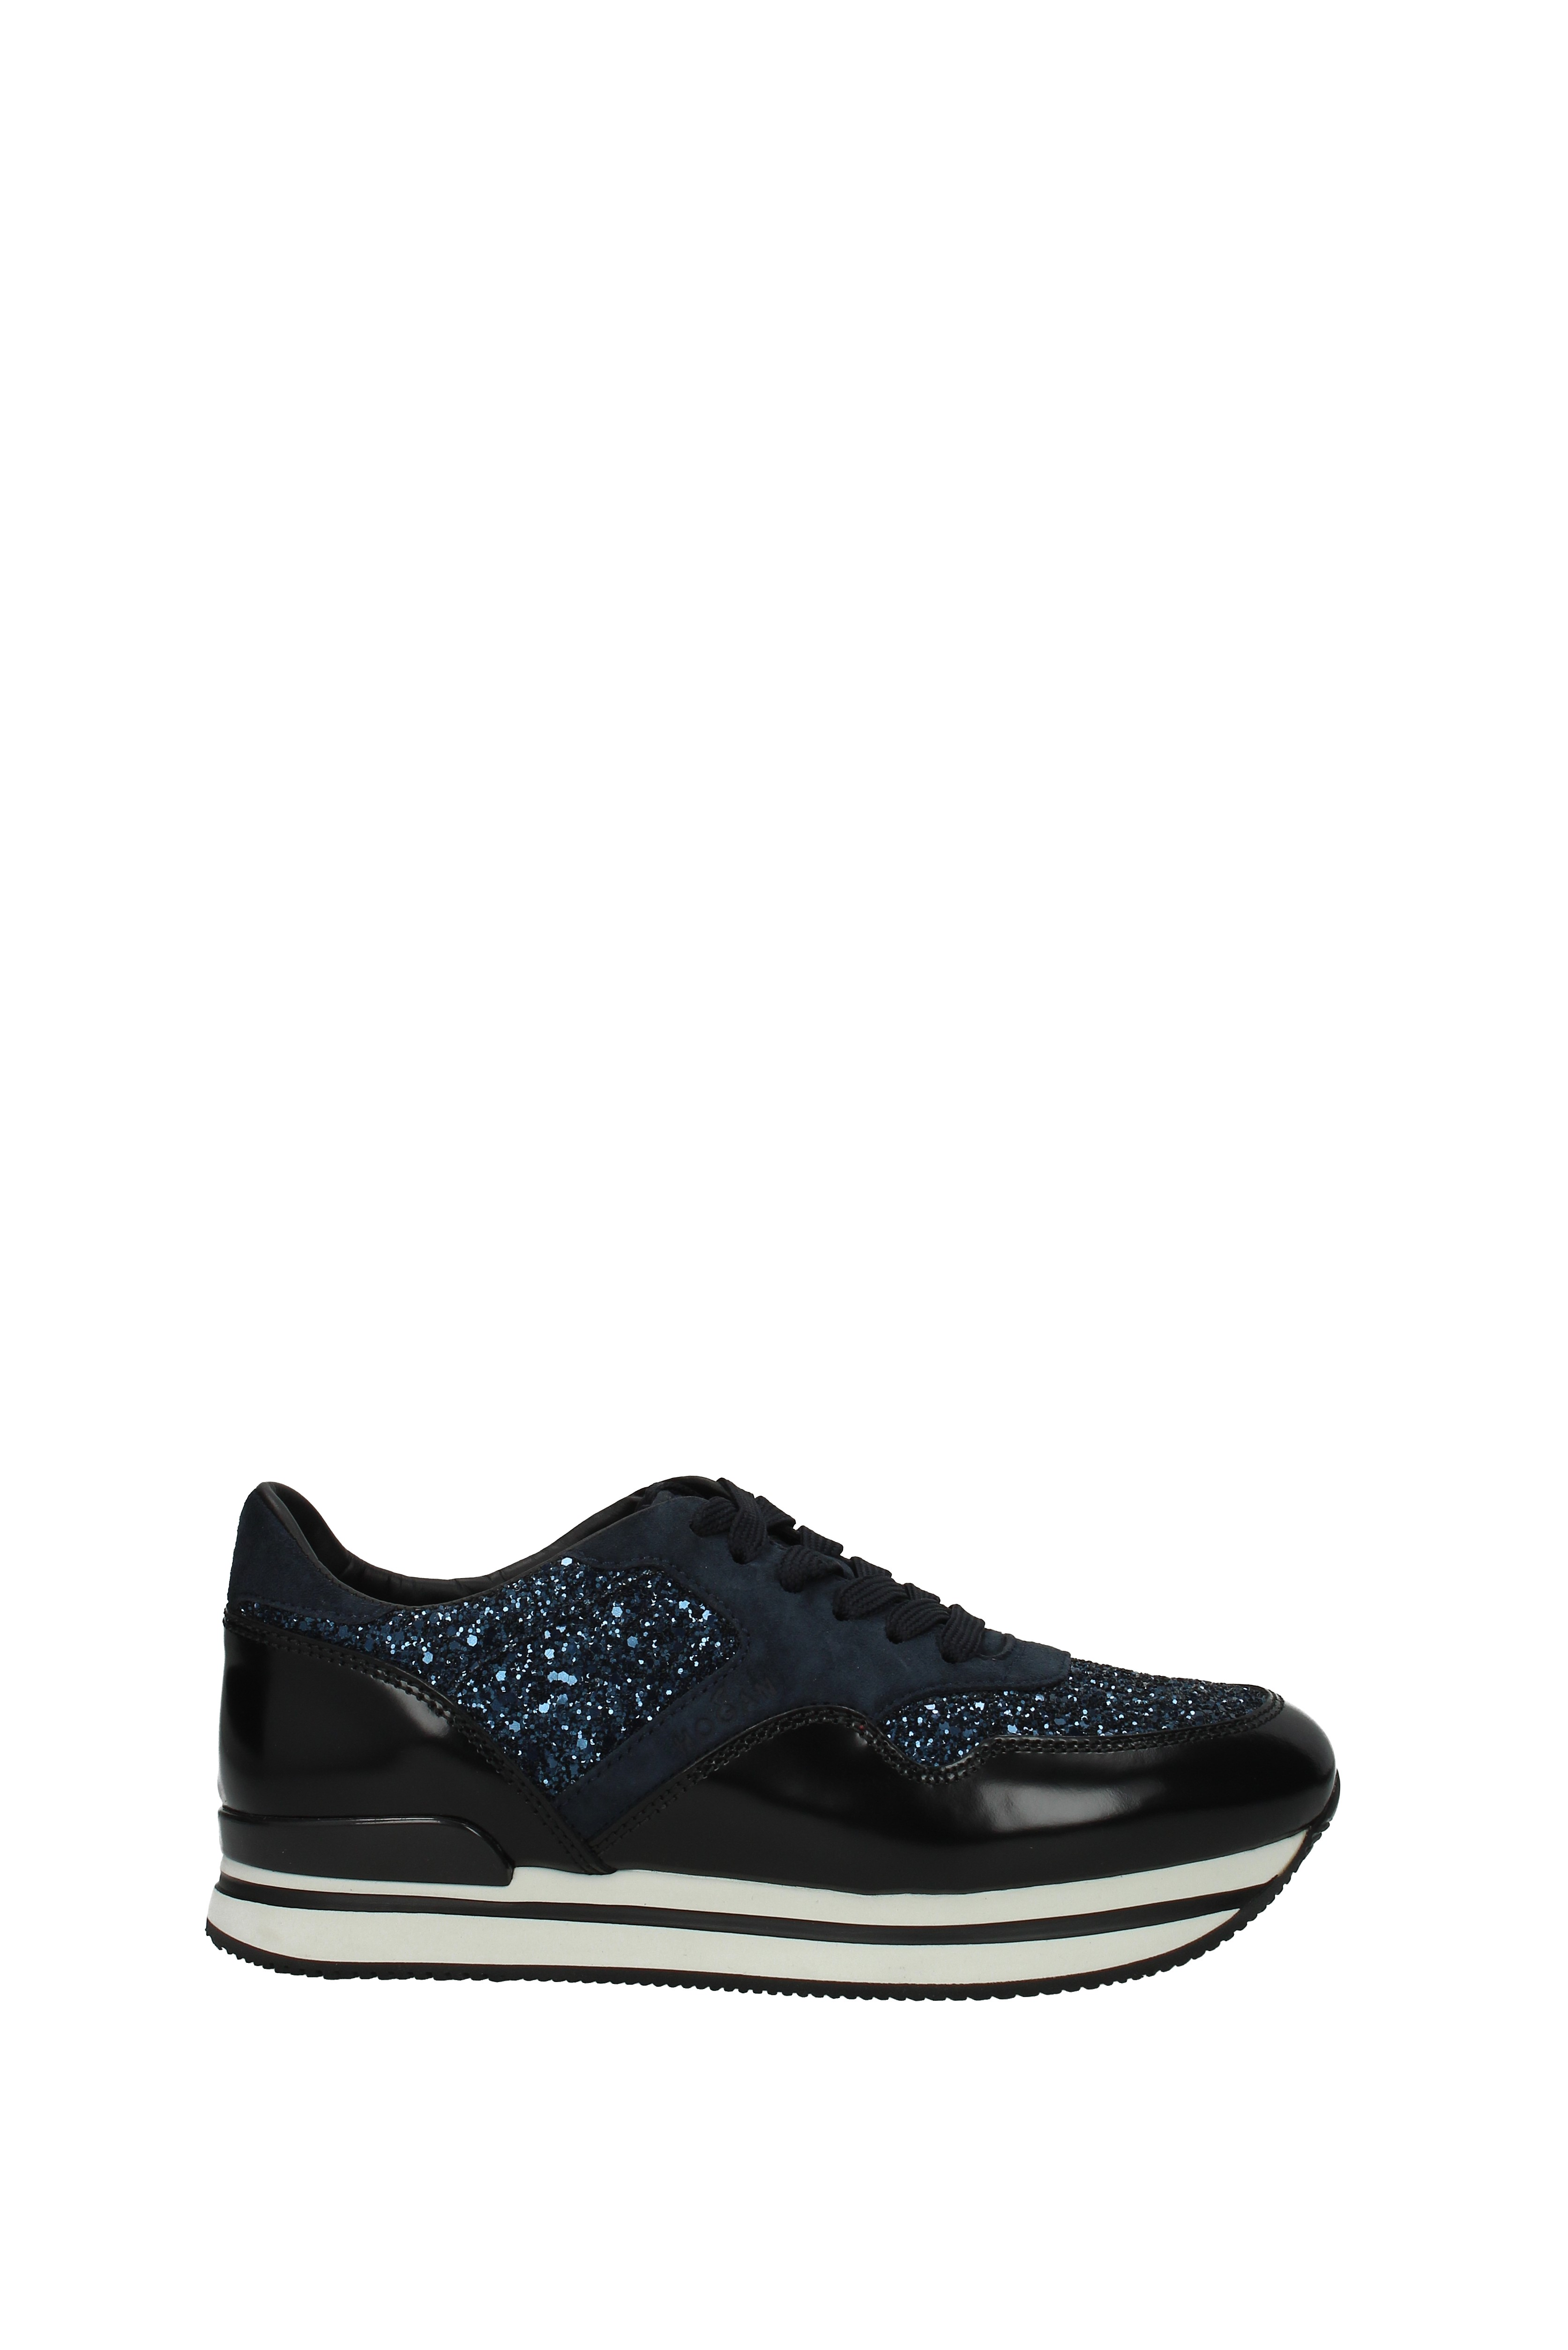 Alta qualit Sneakers Hogan Donna Pelle HXW2220N622HIB vendita -  mainstreetblytheville.org c4050c9f395